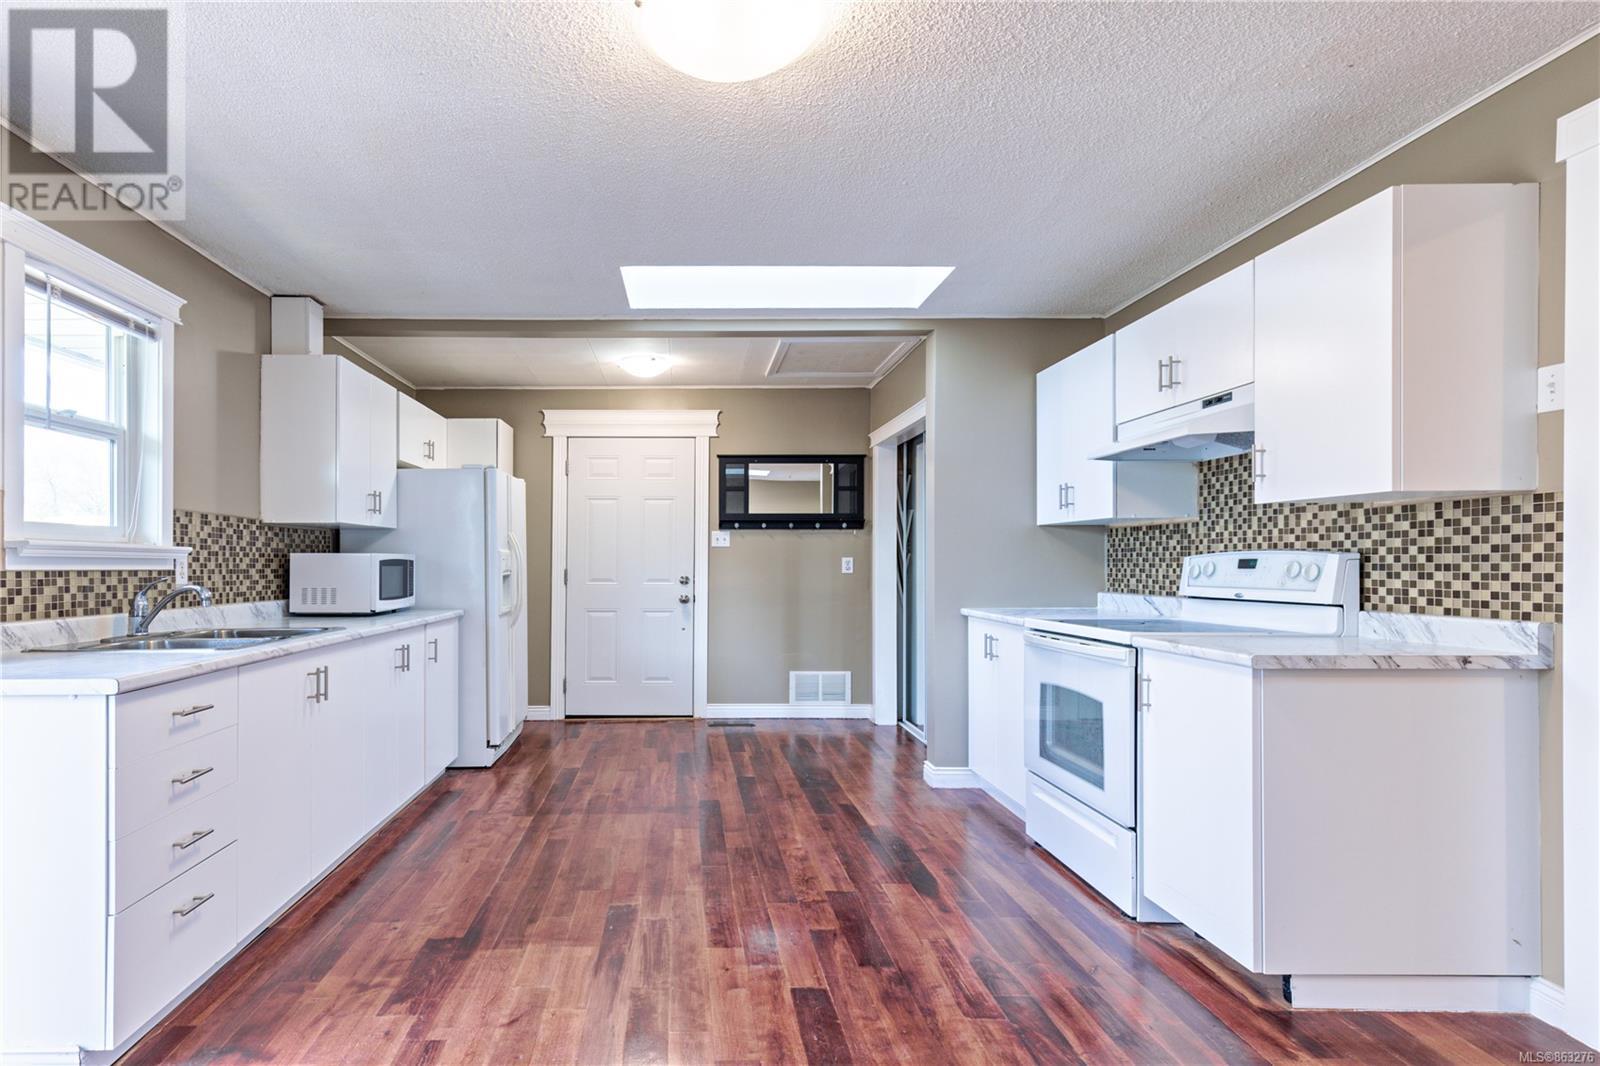 673 Winchester Ave, Nanaimo, British Columbia  V9R 4B6 - Photo 31 - 863276